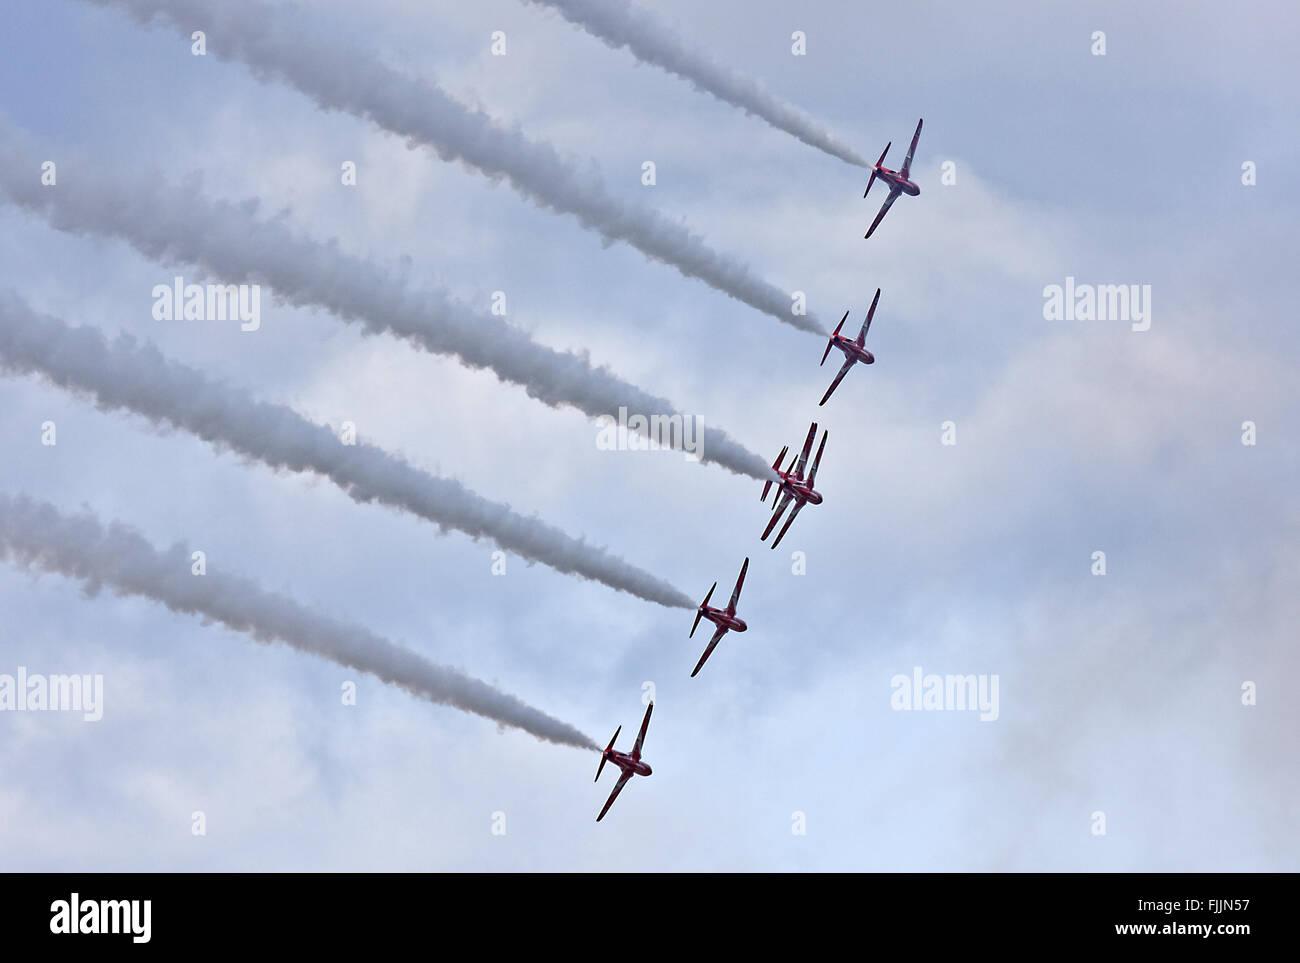 RAF Aerobatic Team Red Arrows, 7 ship formation - Stock Image